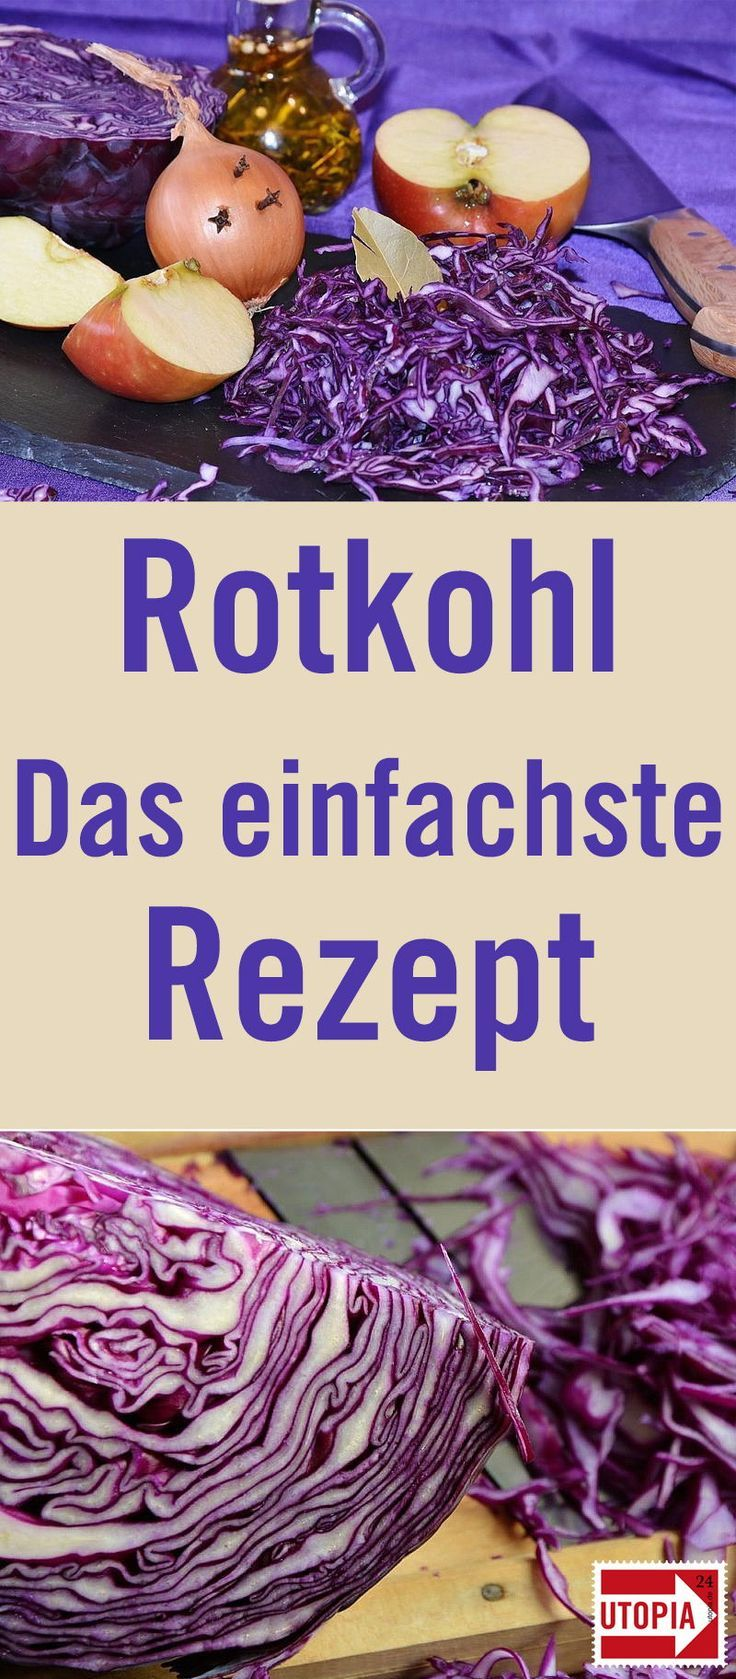 Rotkohl selber machen: Ein klassisches Rezept - Utopia.de